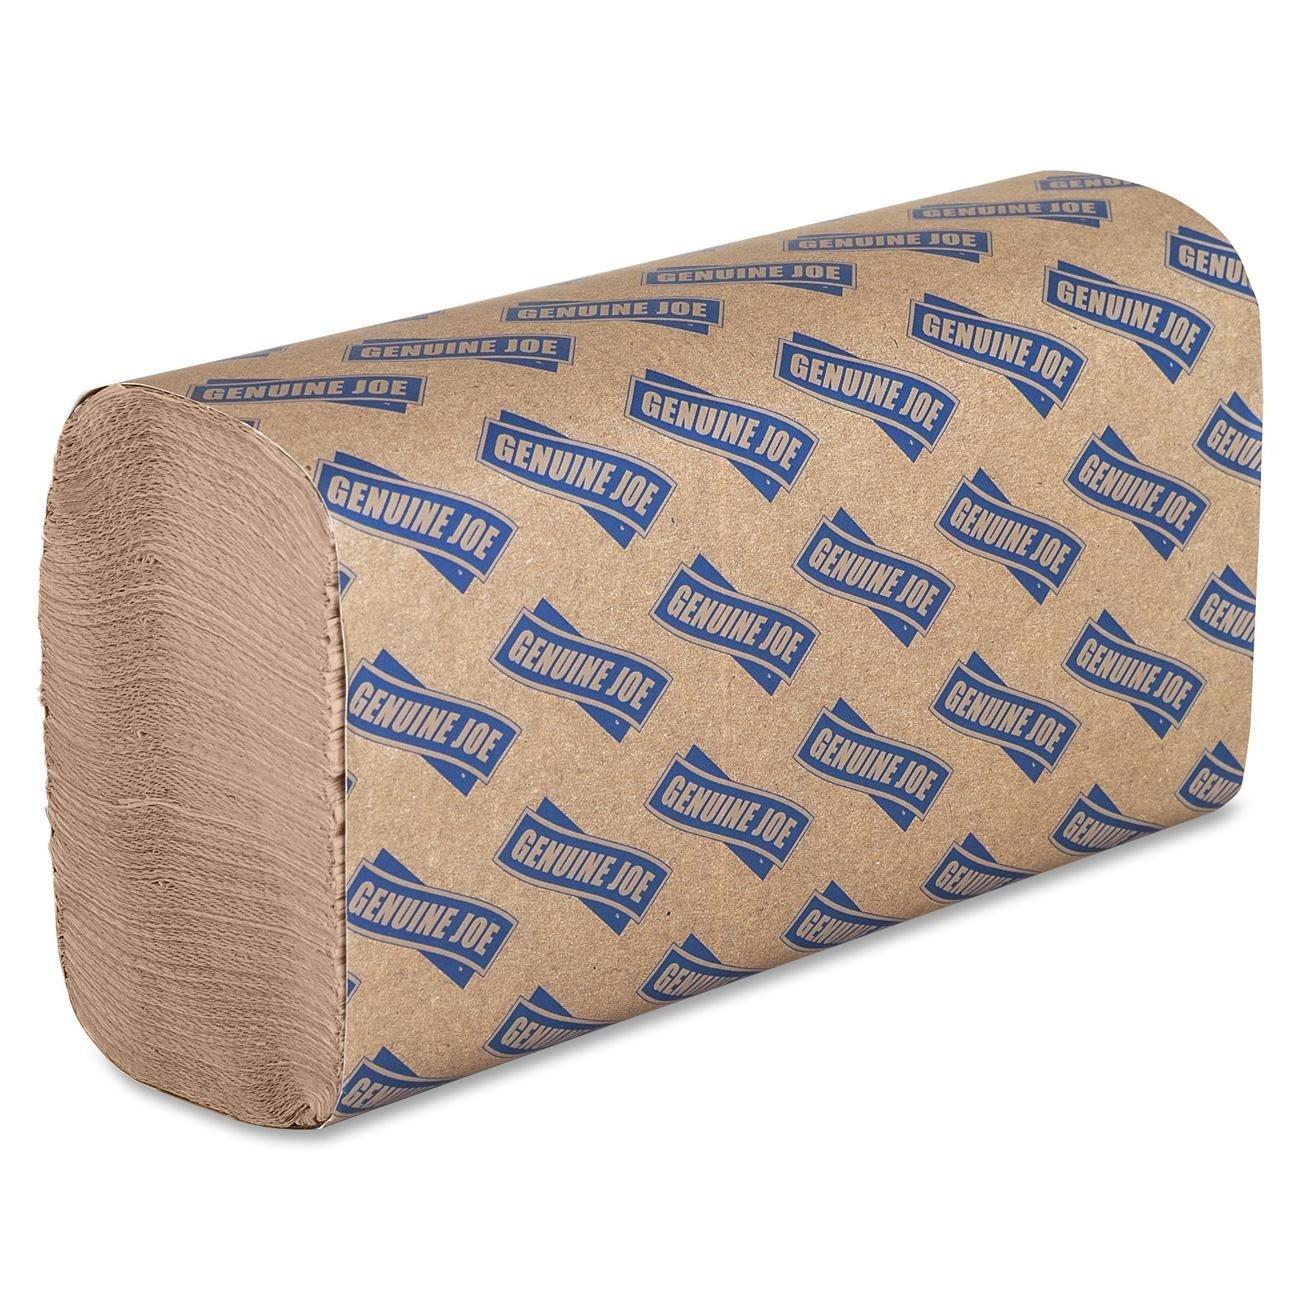 Genuine Joe GJO21040 Multifold Natural Towels, 9.25'' x 9.40''